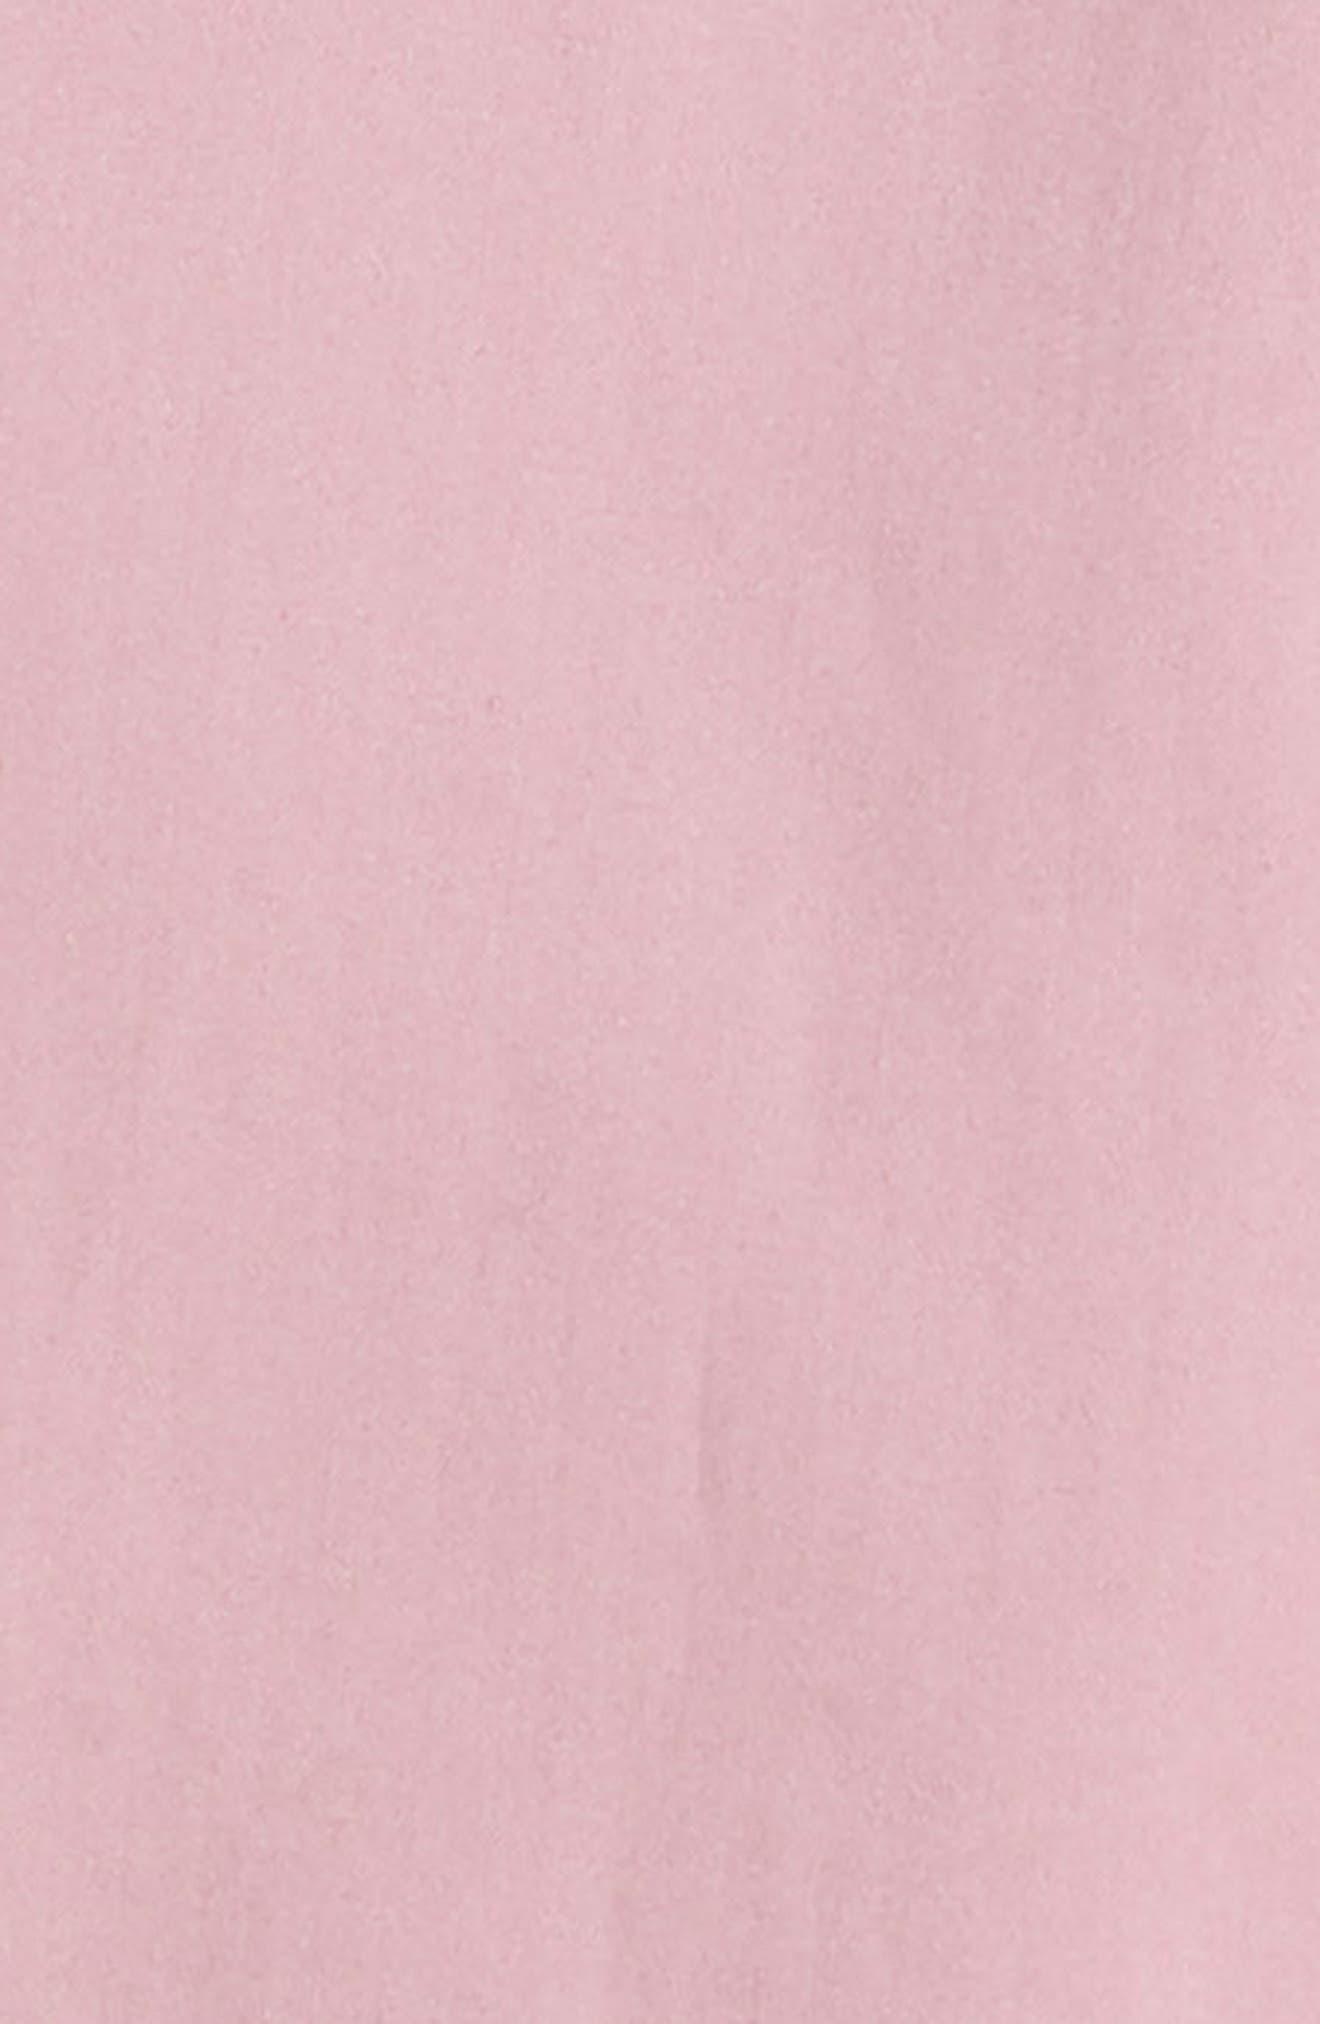 Oversize Sleeve Tunic Dress,                             Alternate thumbnail 4, color,                             Dusky Pink